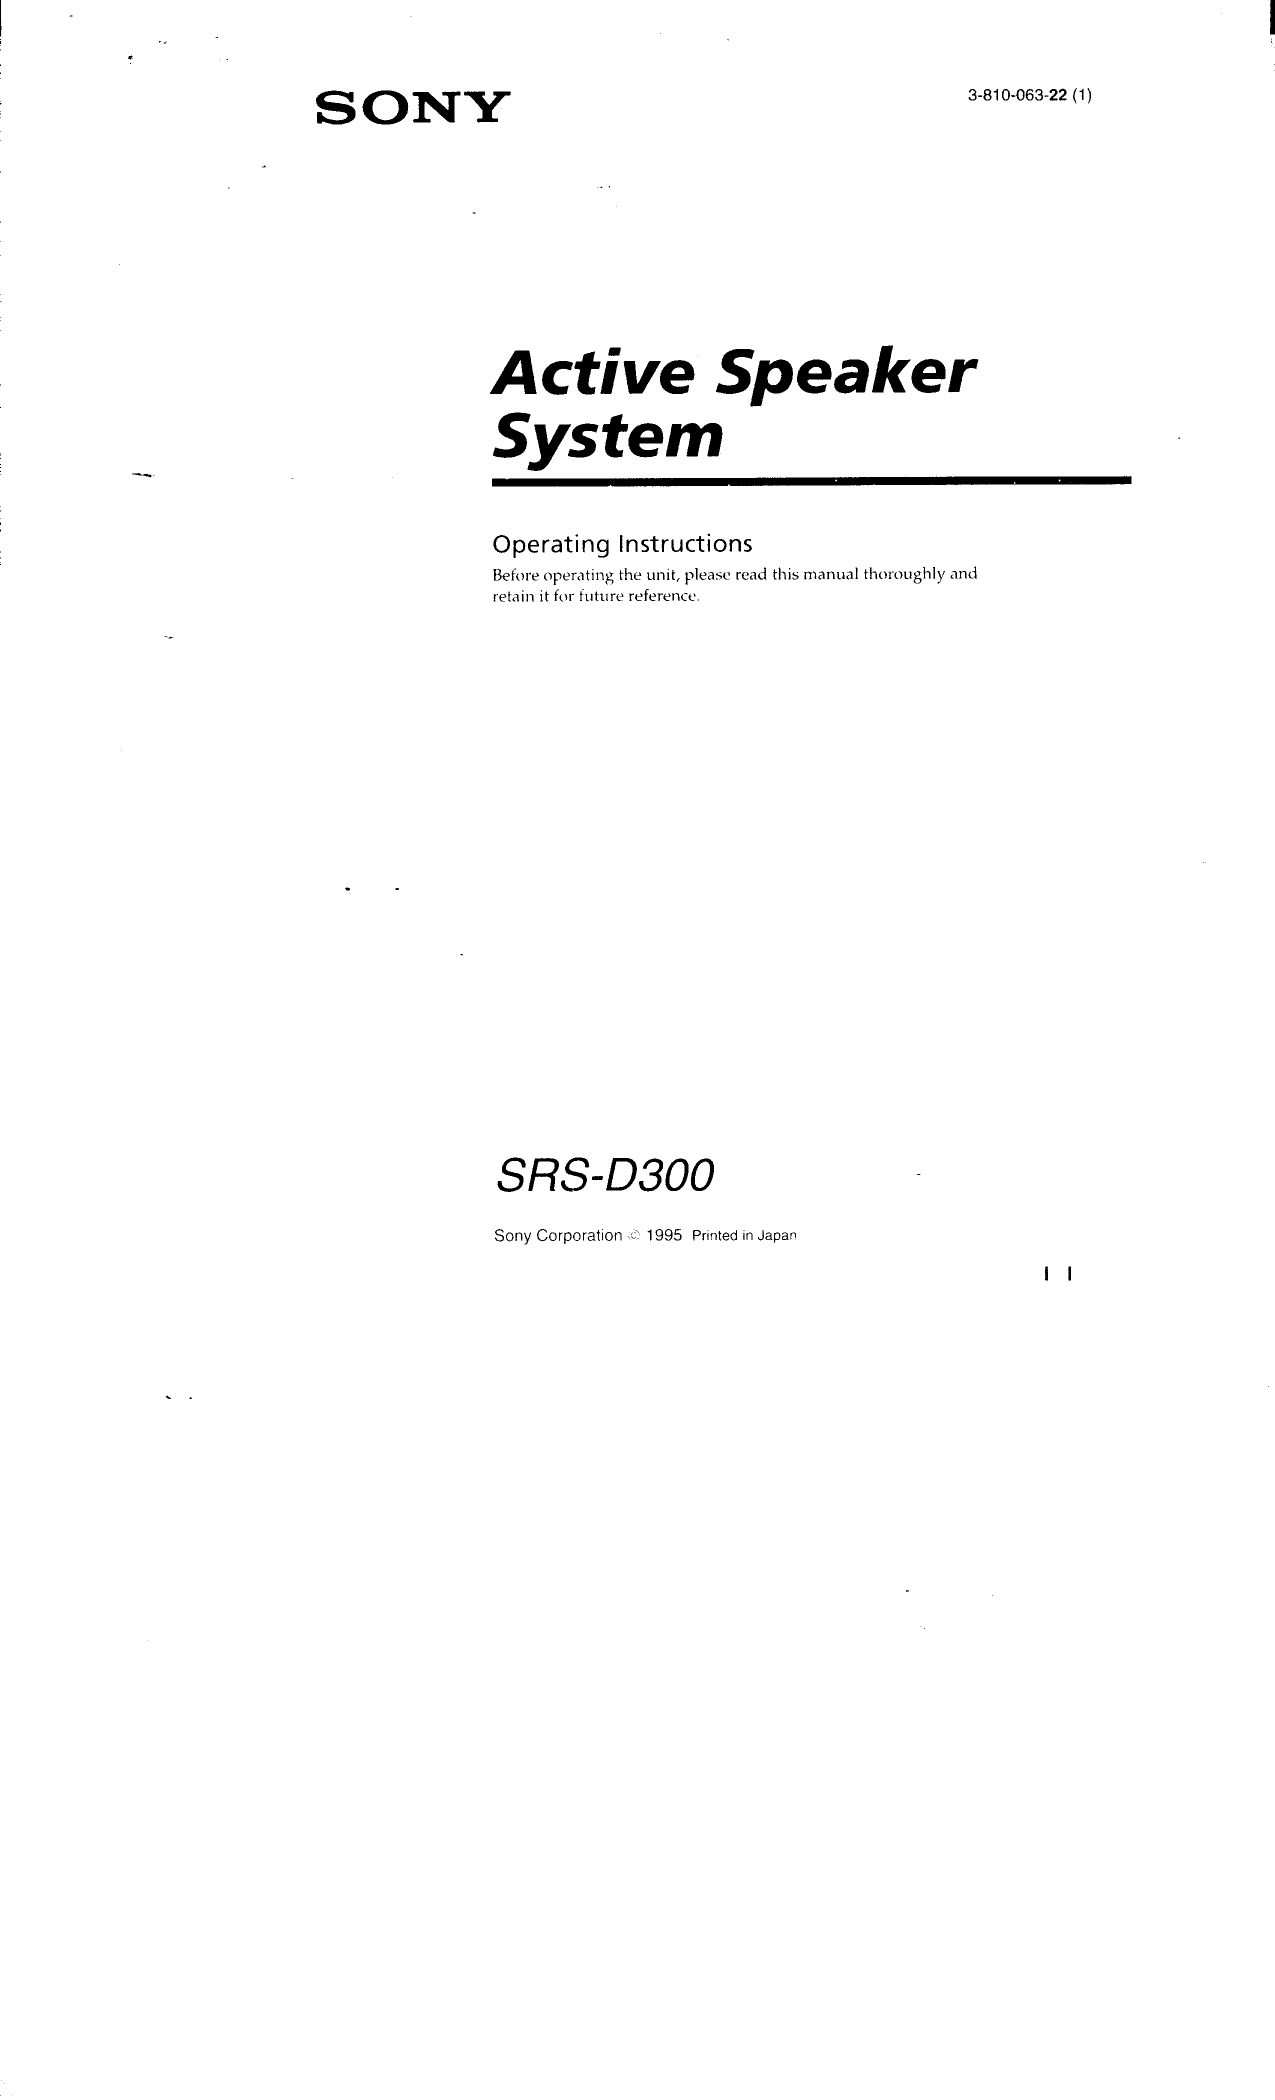 sony srs d300 user manual operating instructions srsd300 rh usermanual wiki datakom d300 user manual nikon d300 user manual english